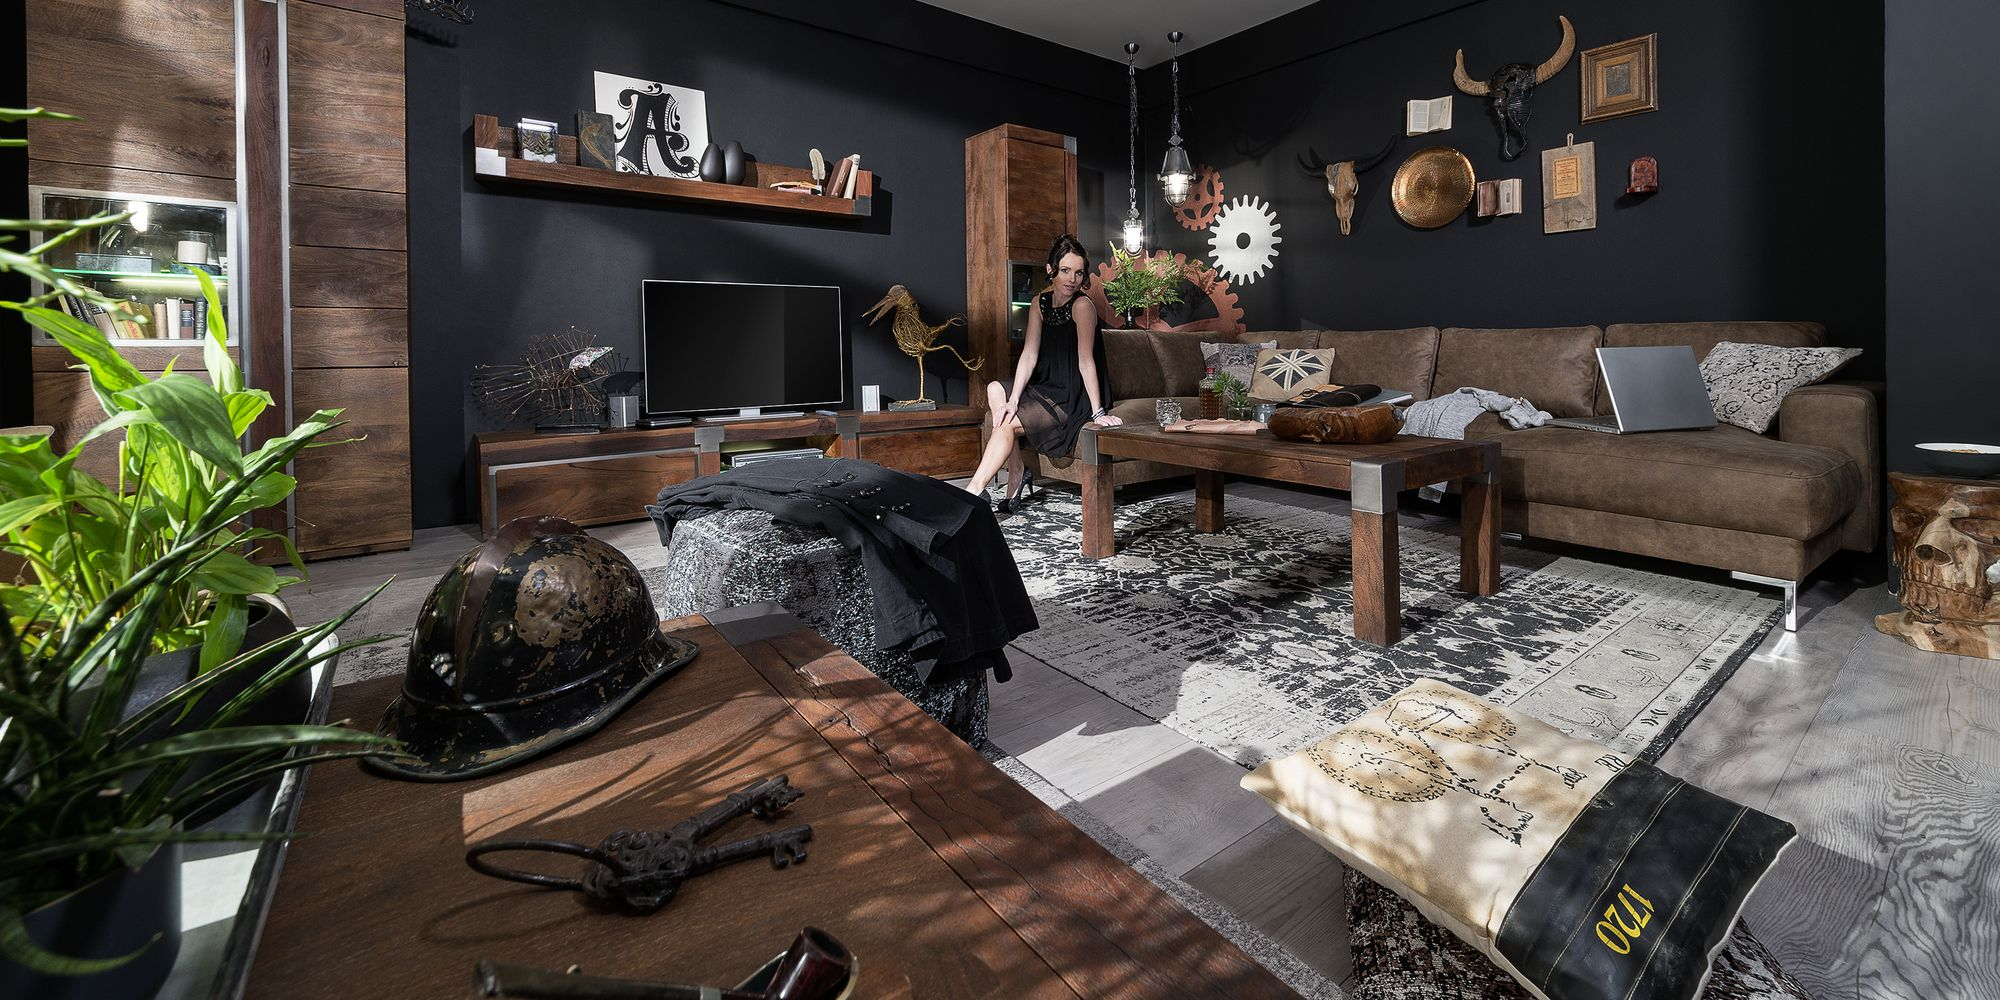 Möbelserie Designermöbel aus Mangoholz ➤ Massivholzmöbel